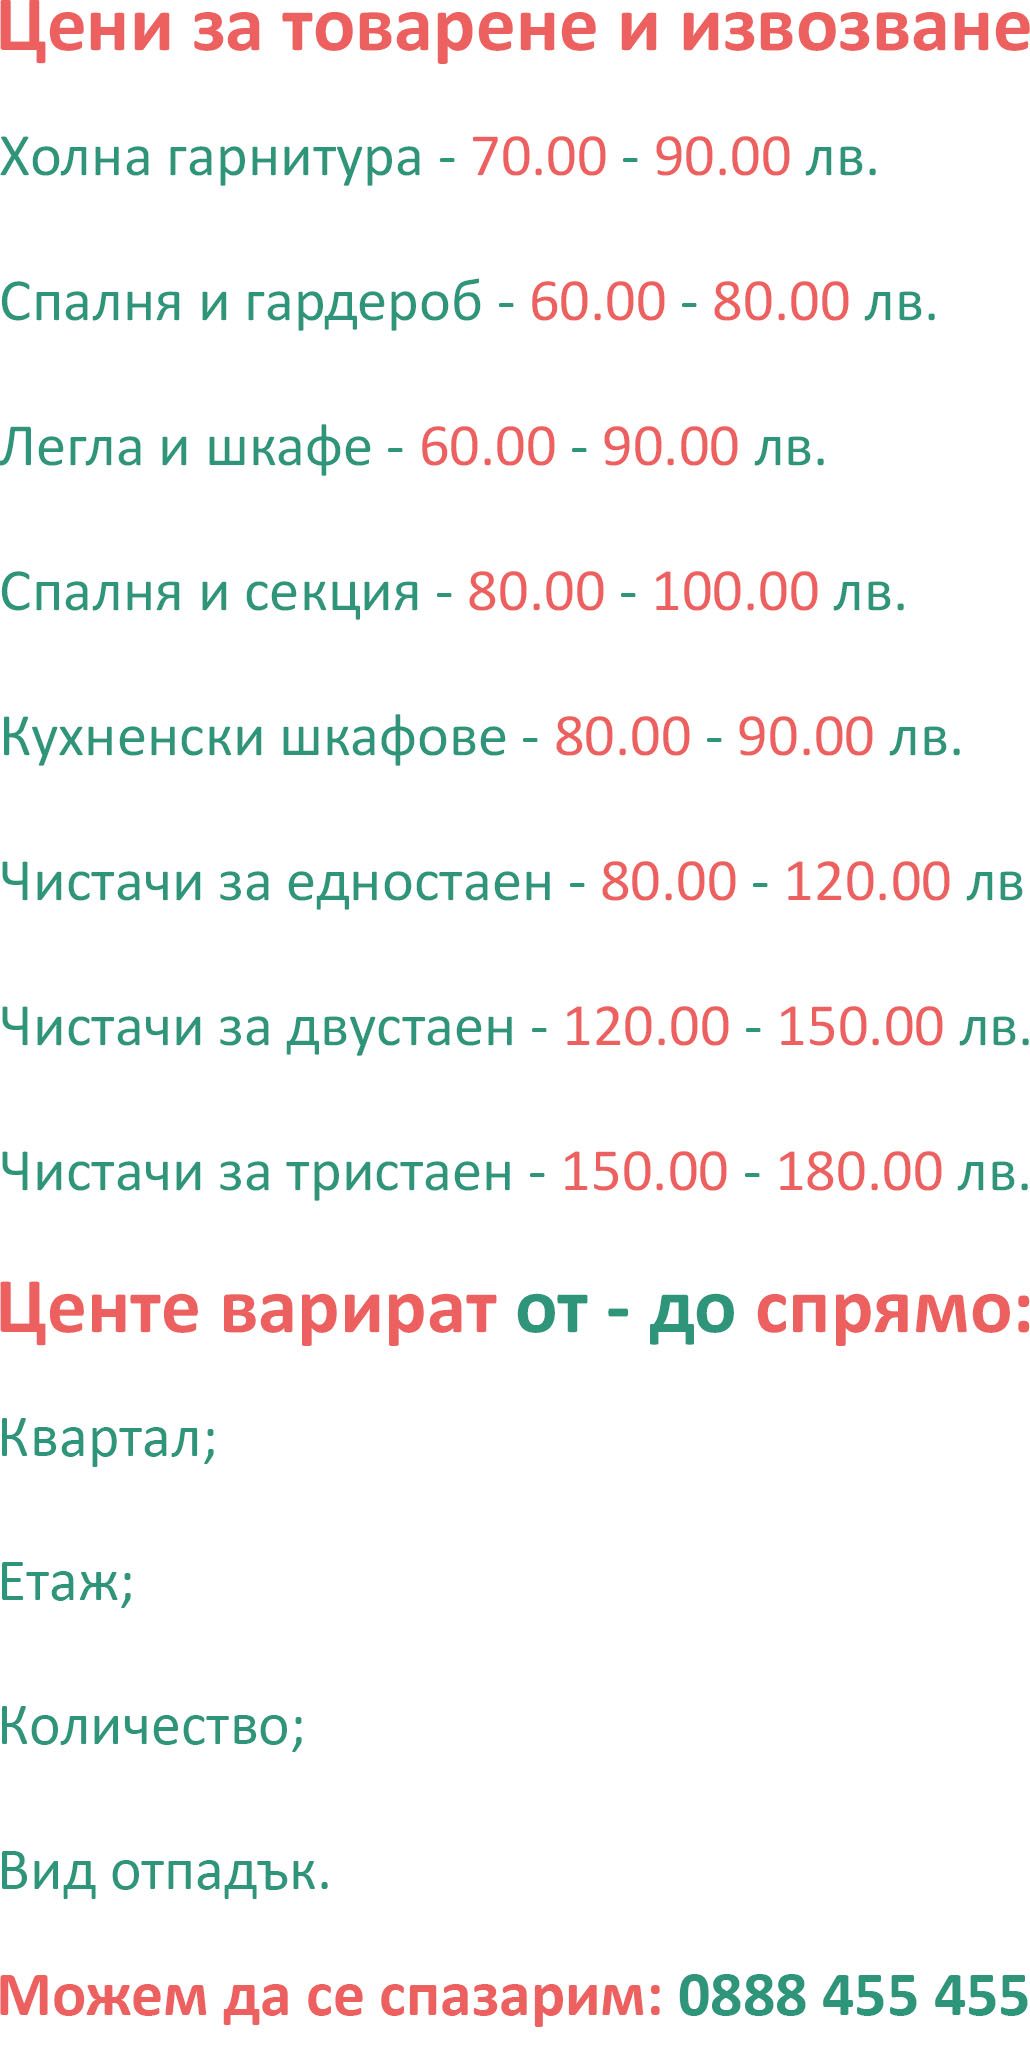 цени за извозване изнасяне на ненужни мебели Габрово